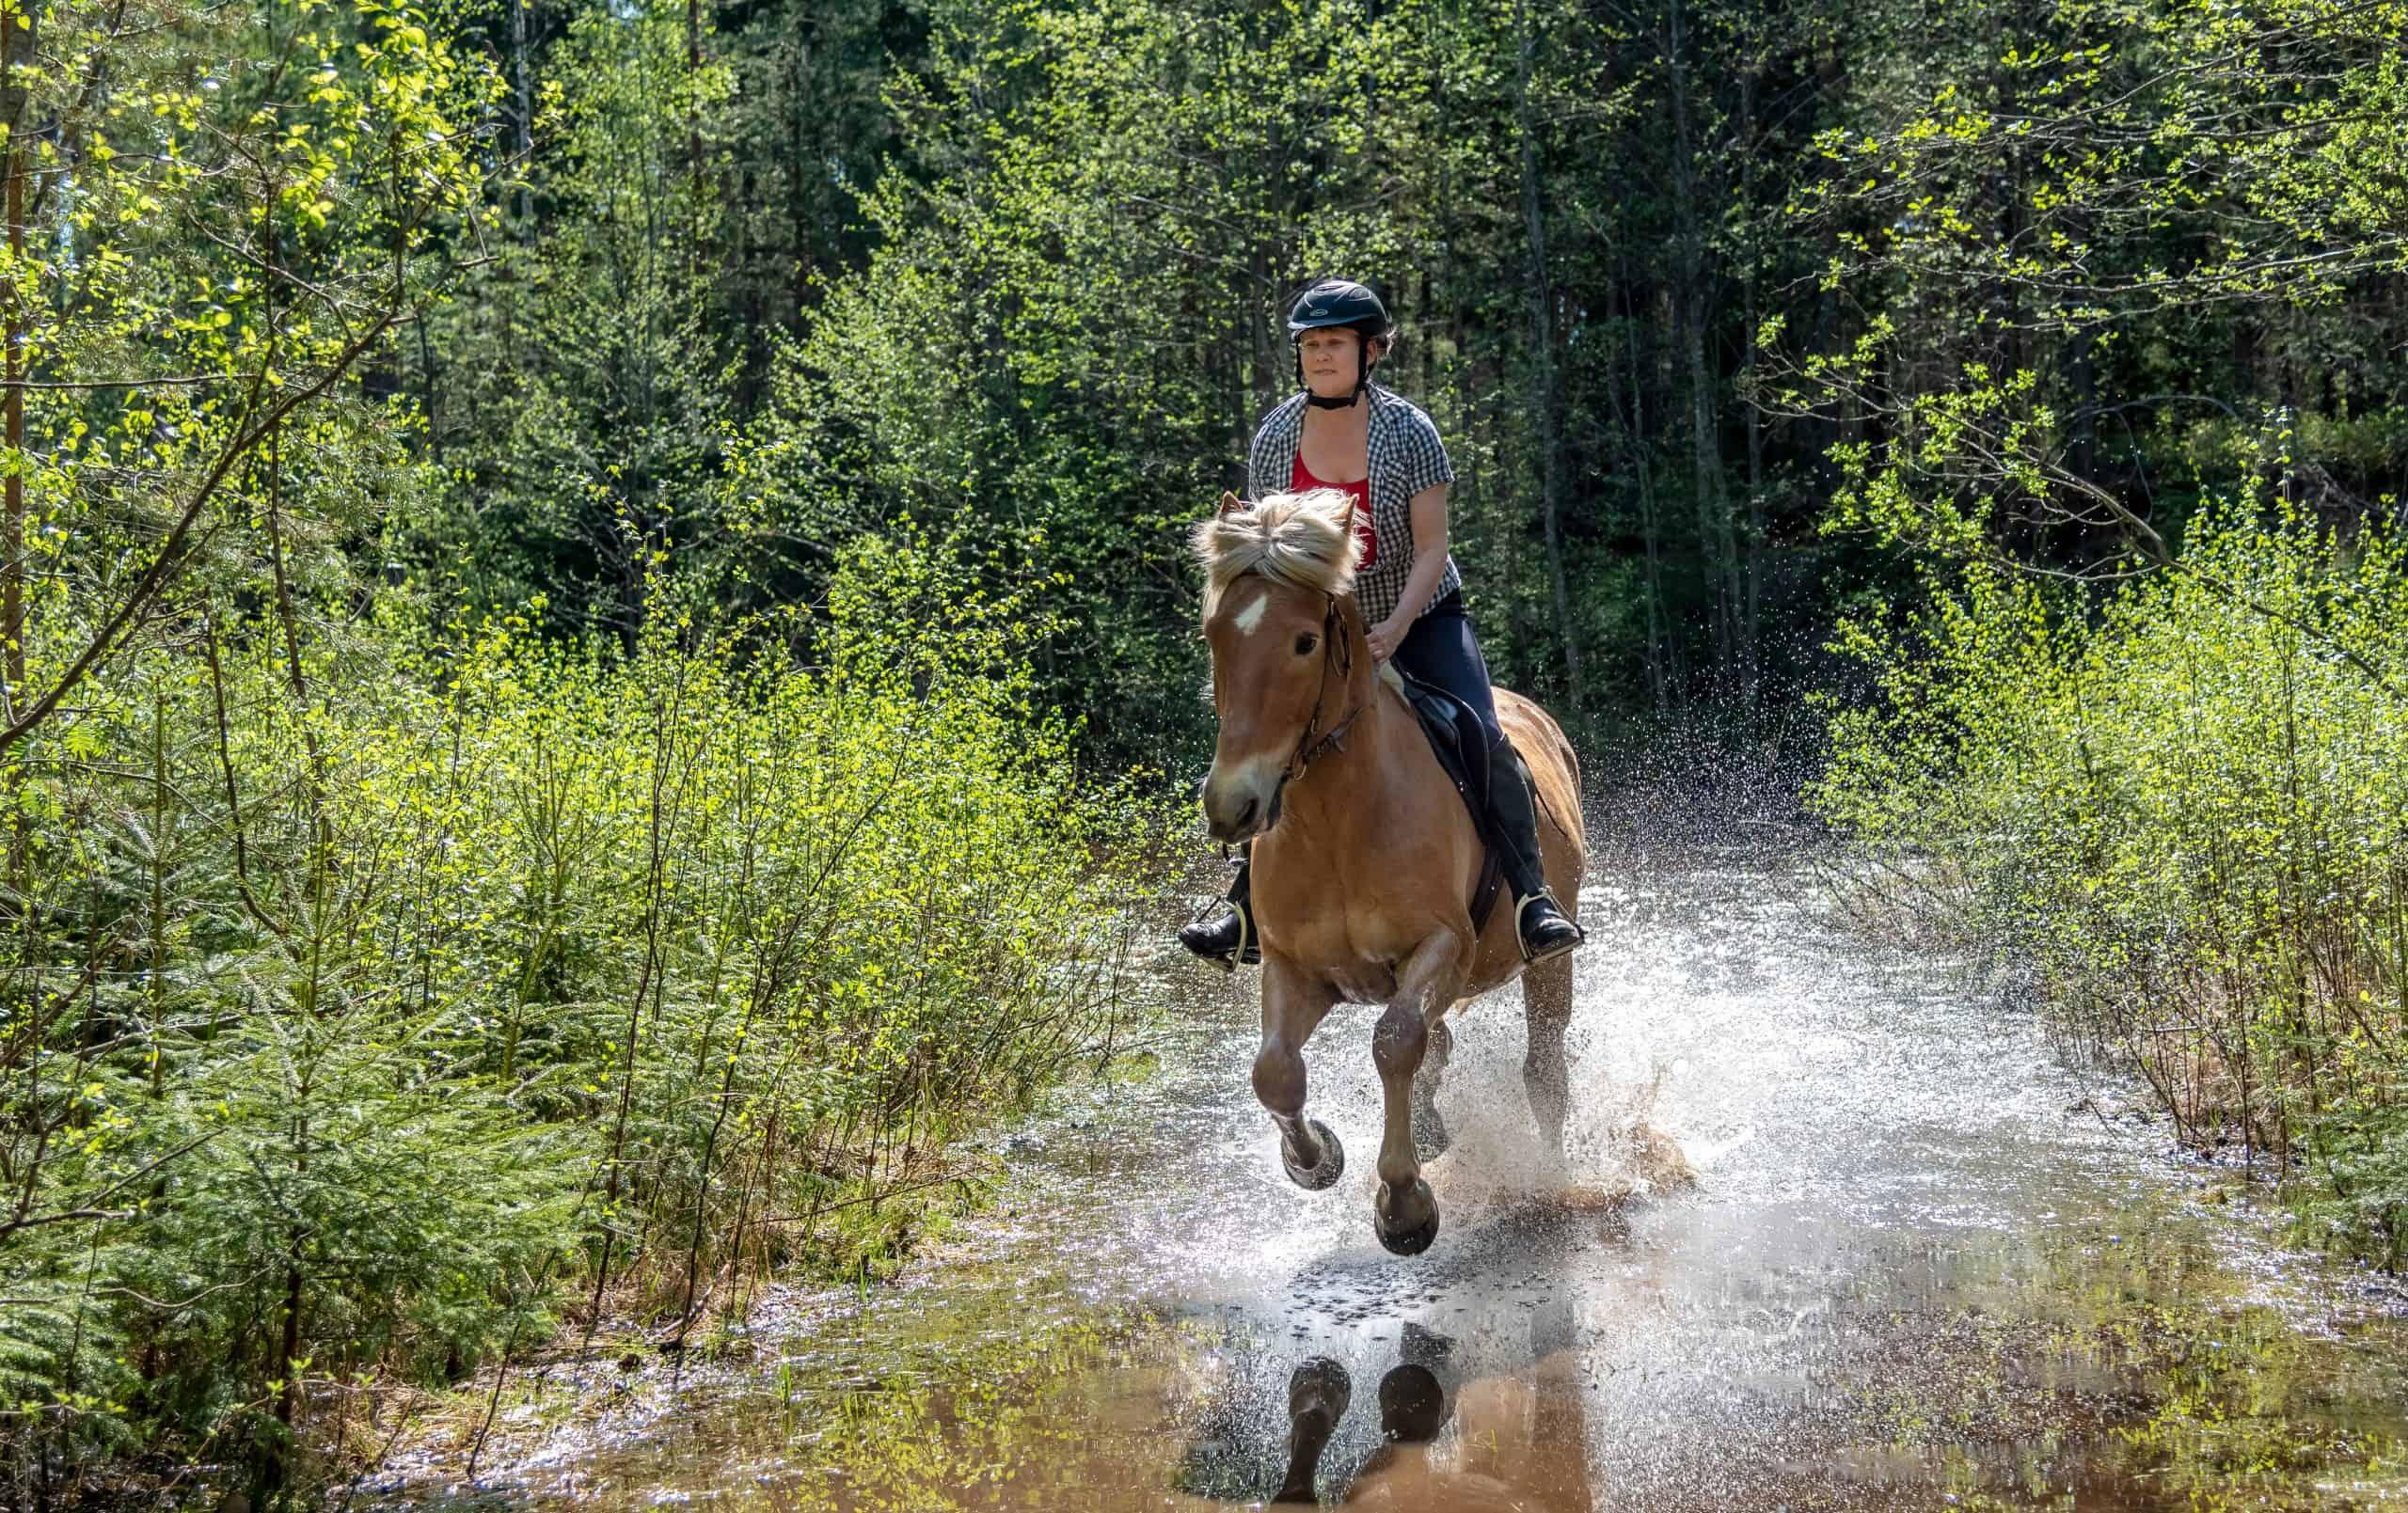 Woman horseback riding on water